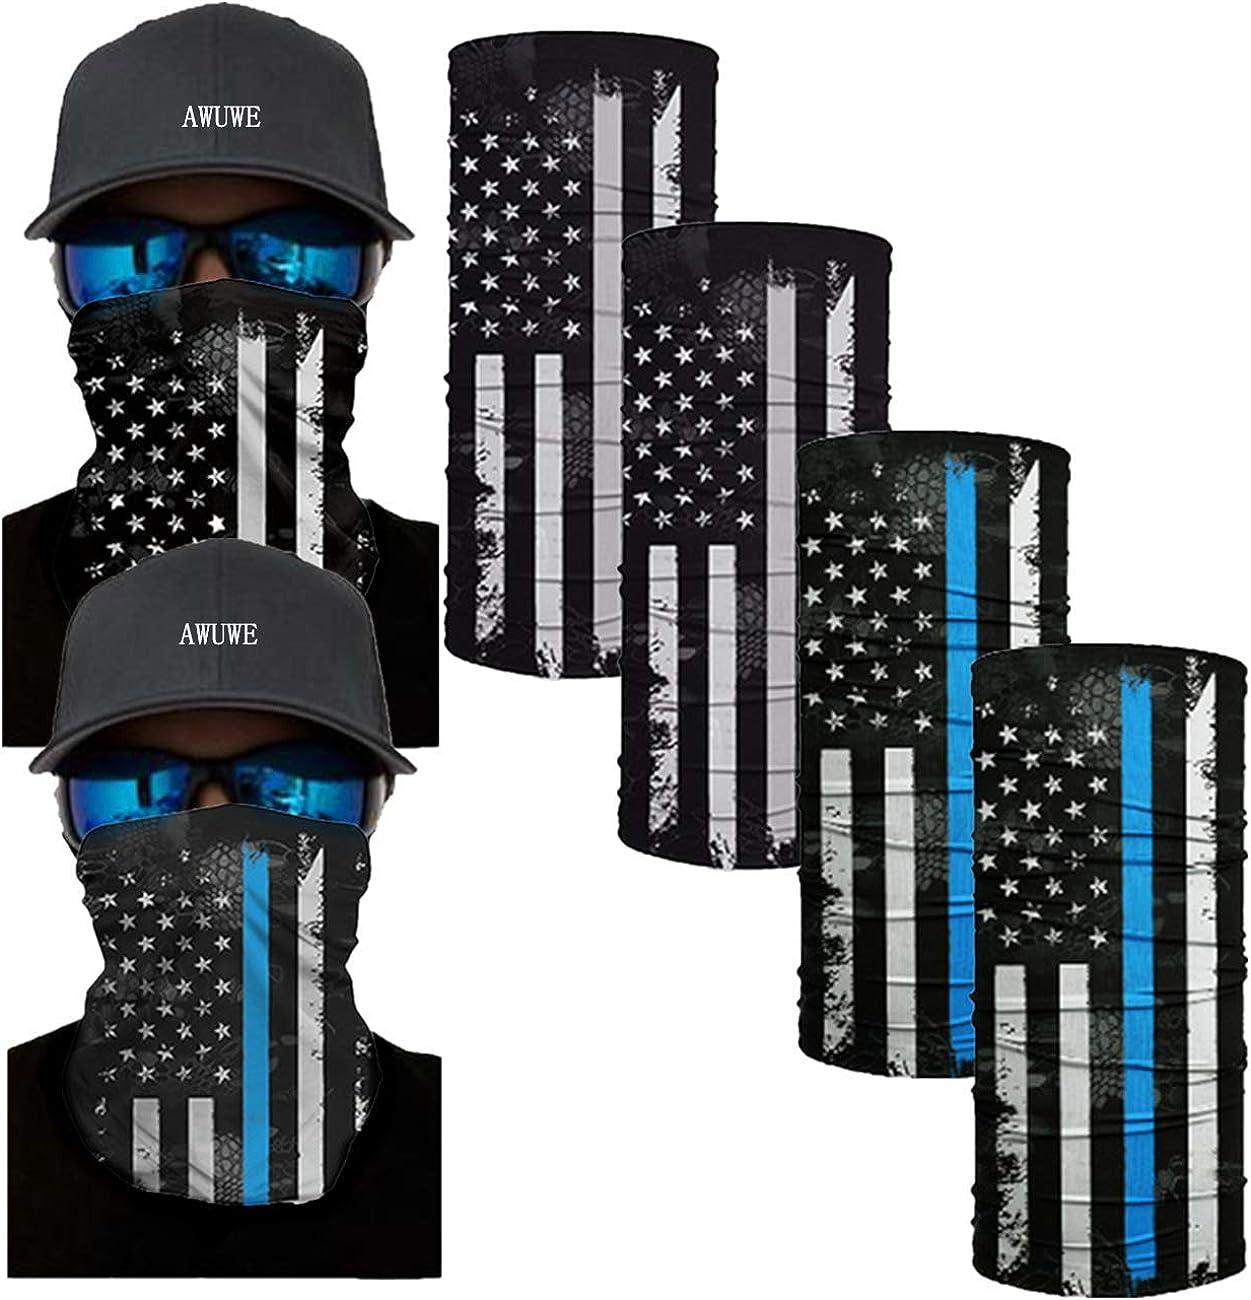 overseas AWUWE Face Mask Max 61% OFF Neck Gaiter Bandana Seamless Bal Scarf Headbands